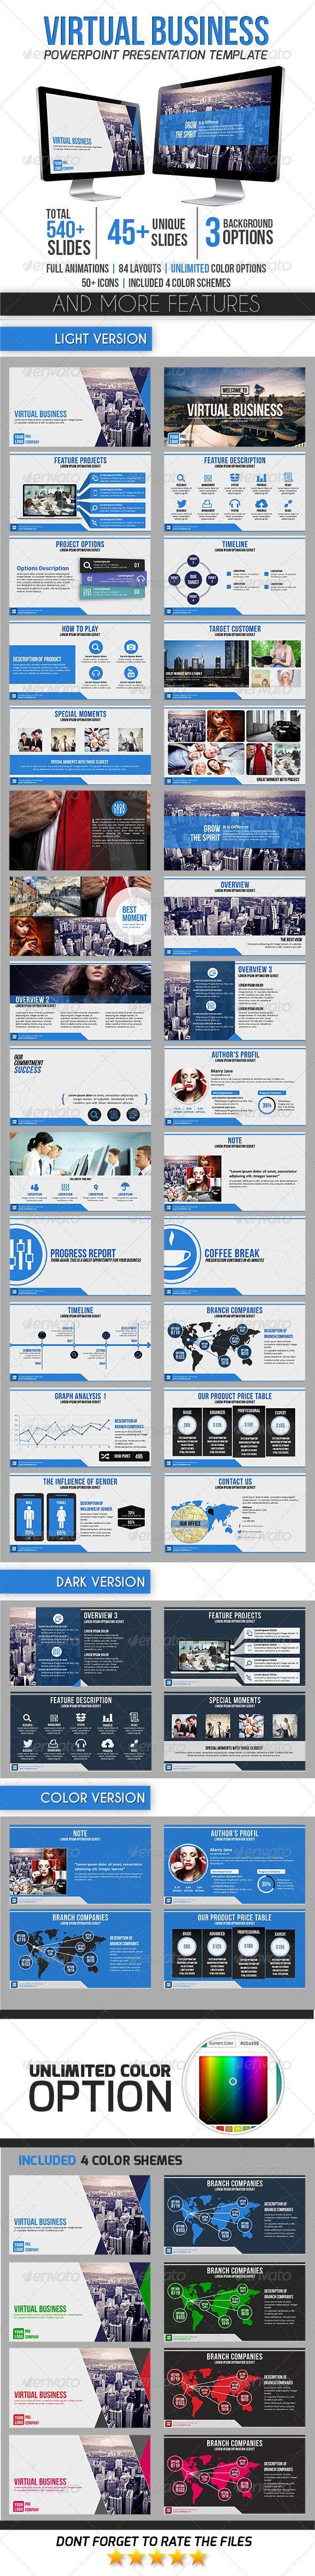 Virtual Business